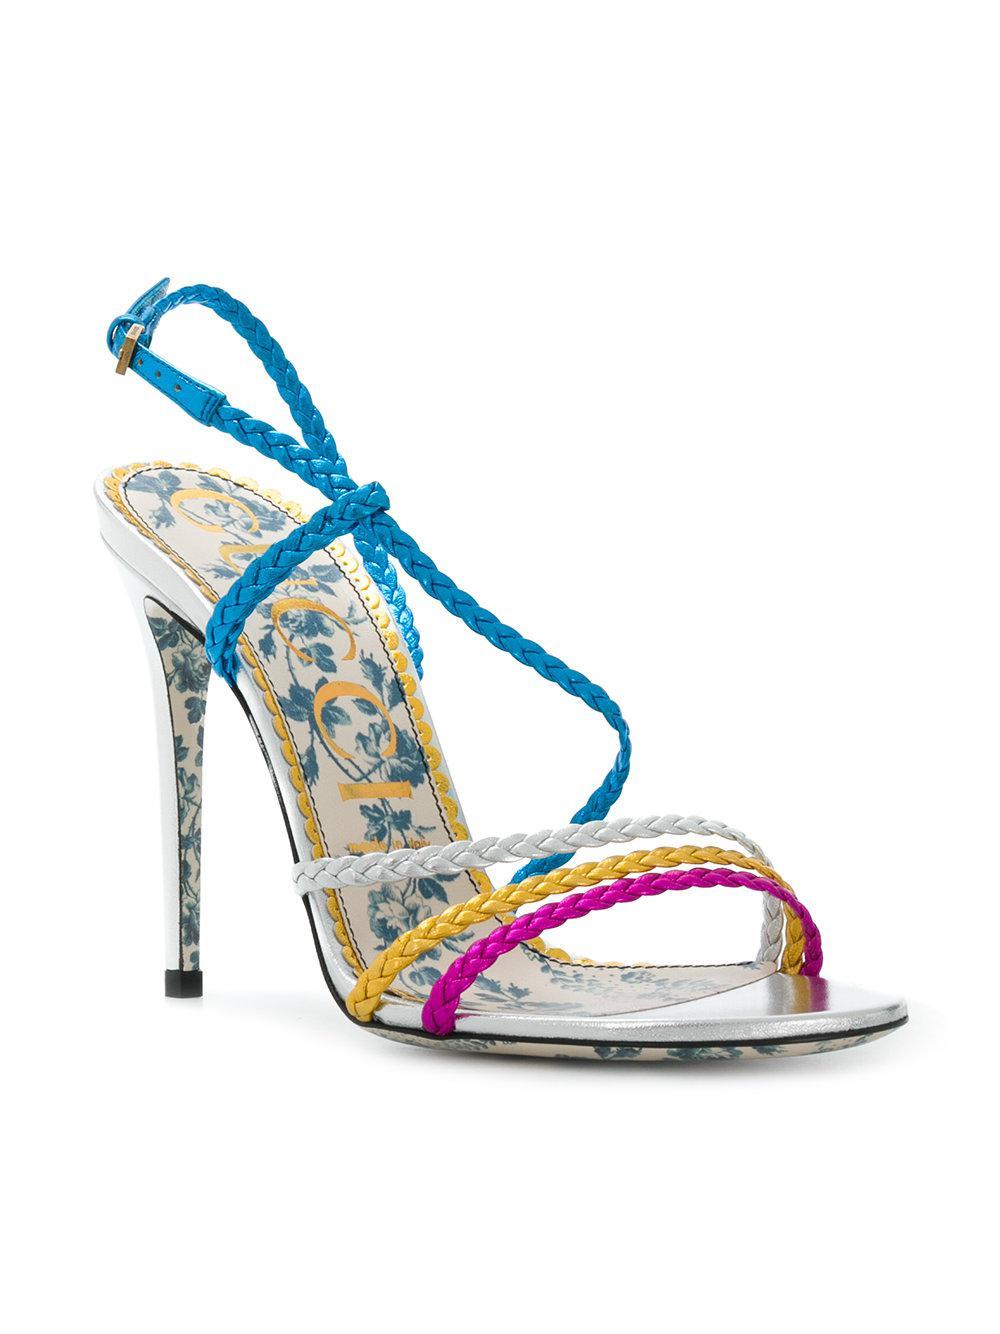 d77882f2e09 Lyst - Gucci Braided Sandals in Blue - Save 13%